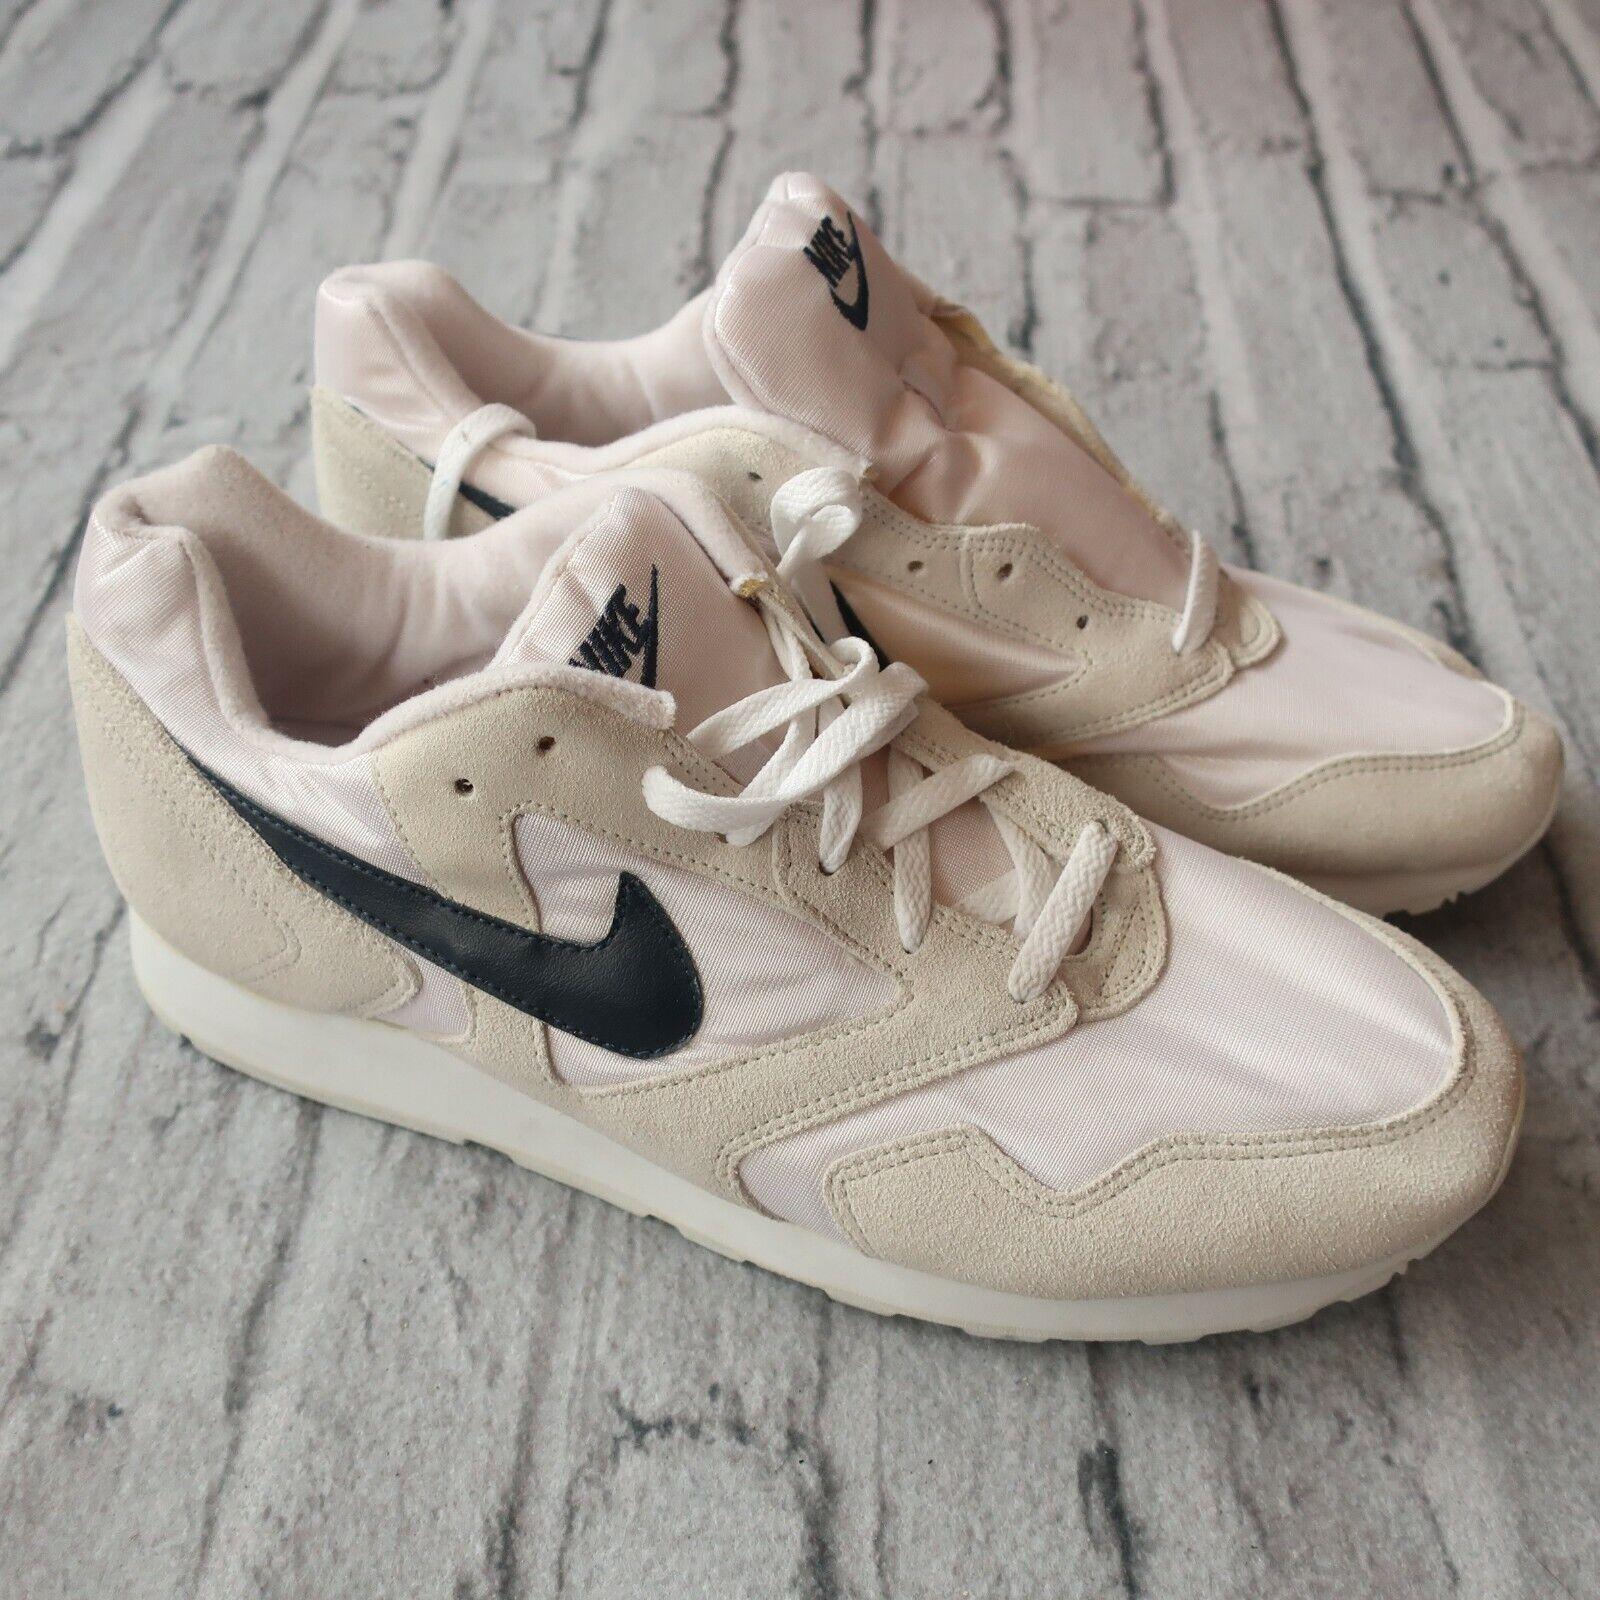 Vintage New 1993 OG Nike Decade Heavans Gate shoes shoes shoes 102010-140 Size 13 47a8e1